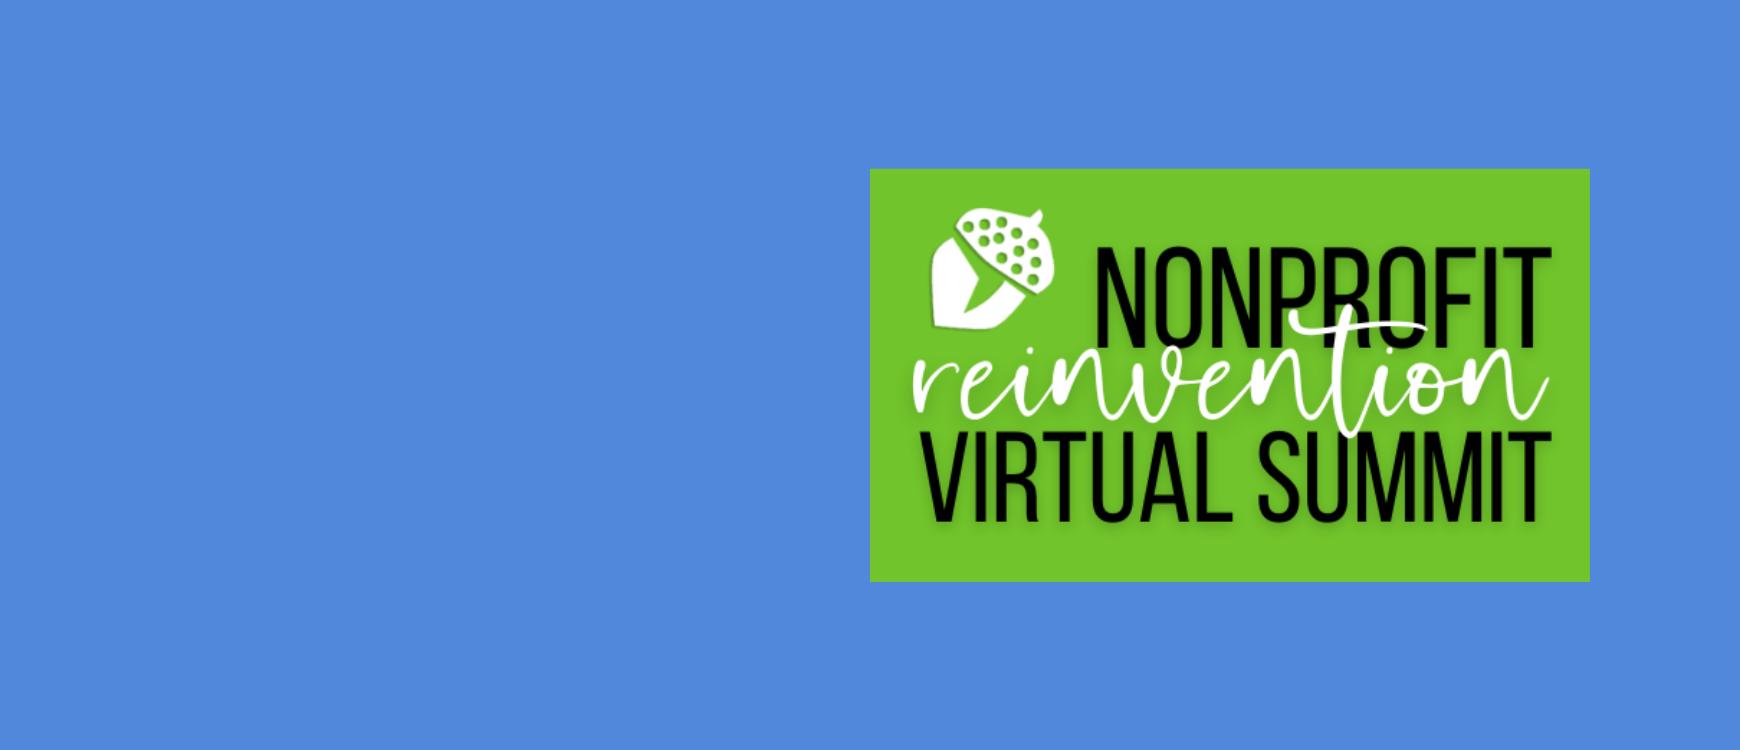 2020 Nonprofit Reinvention Summit - join us virtually!